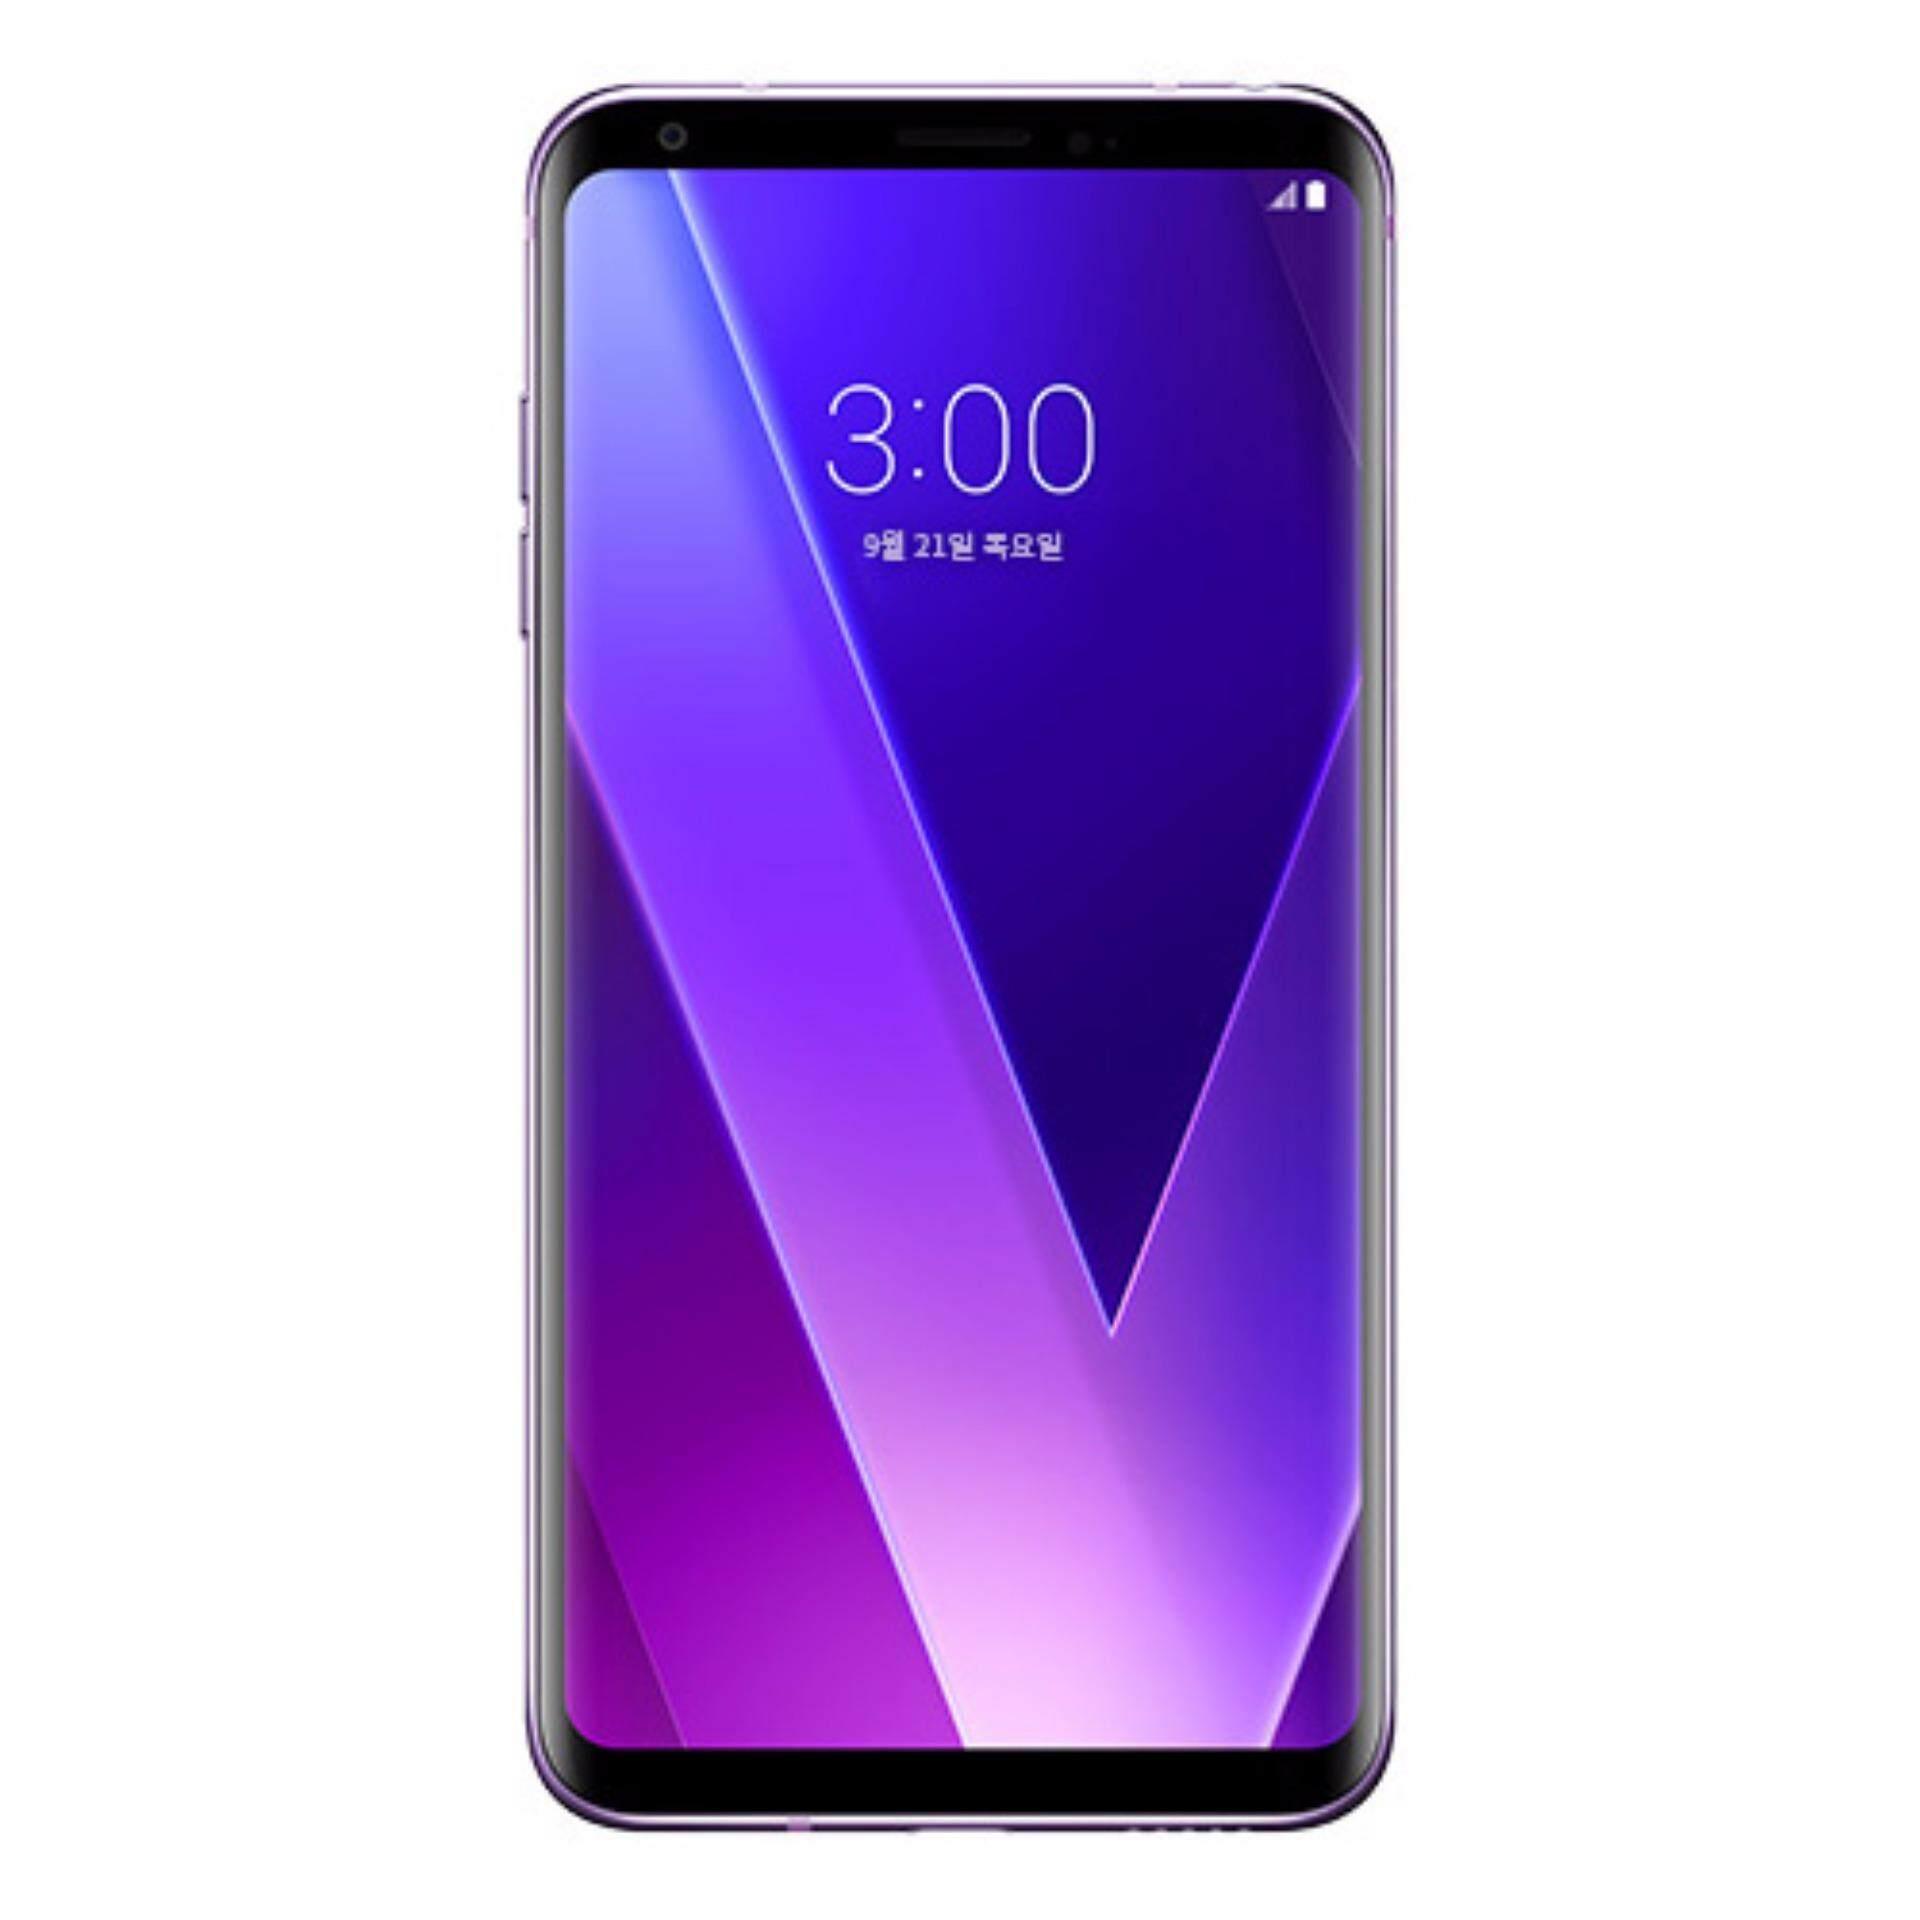 PRE ORDER LG V30 128GB V300 Lavender Violet